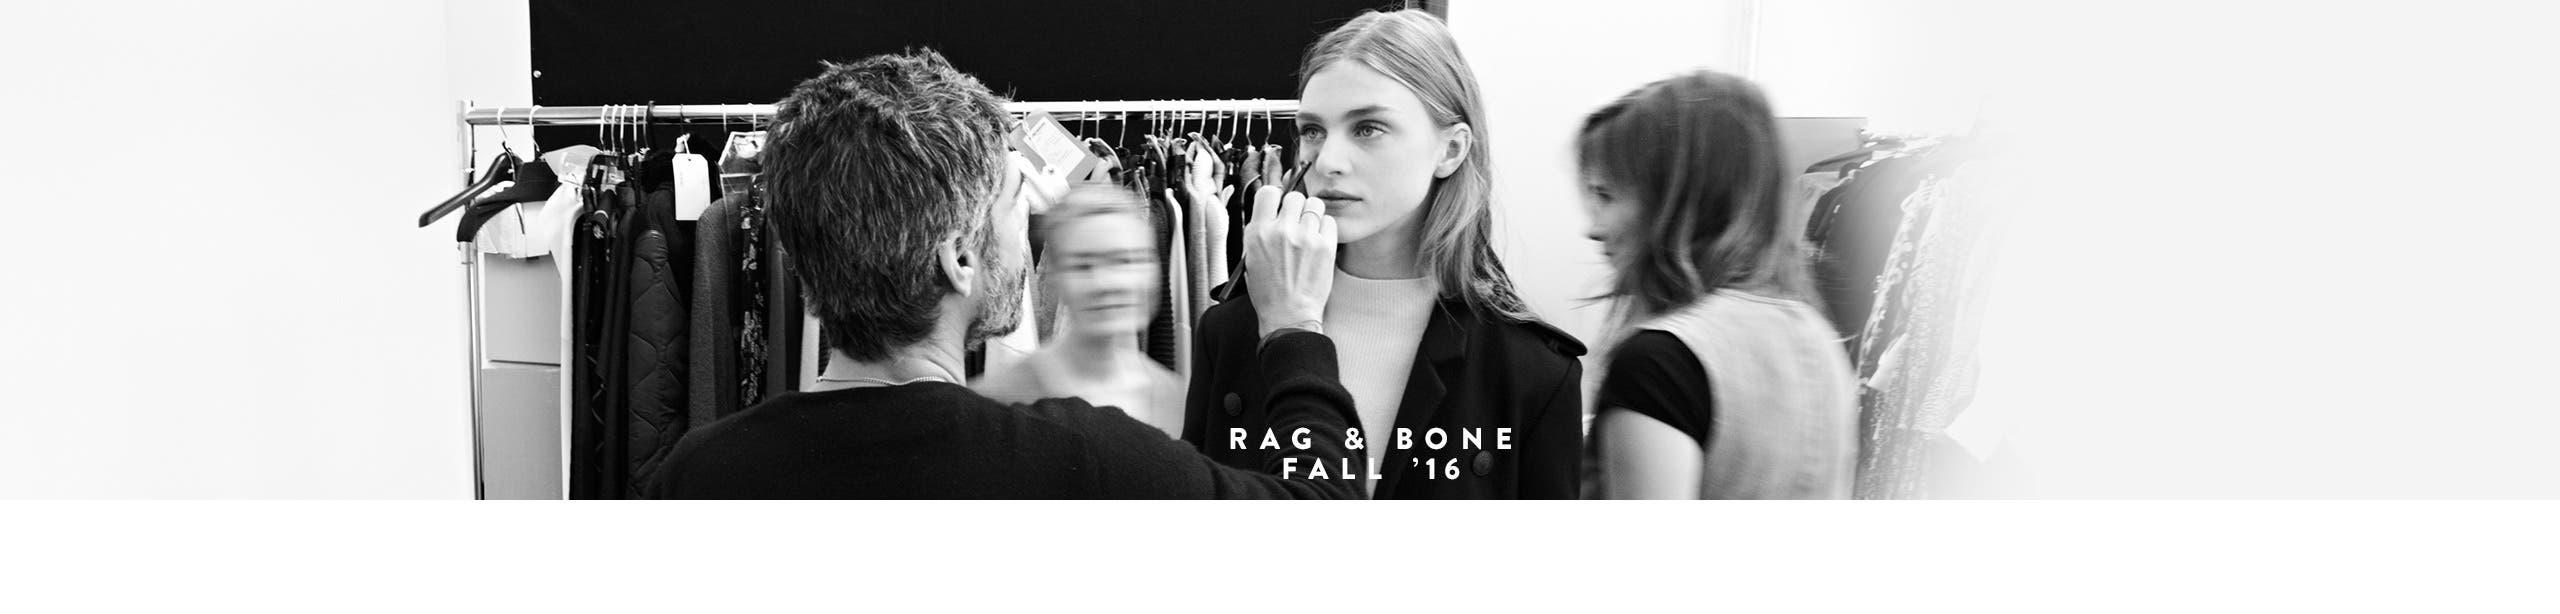 rag & bone fall '16 for women.